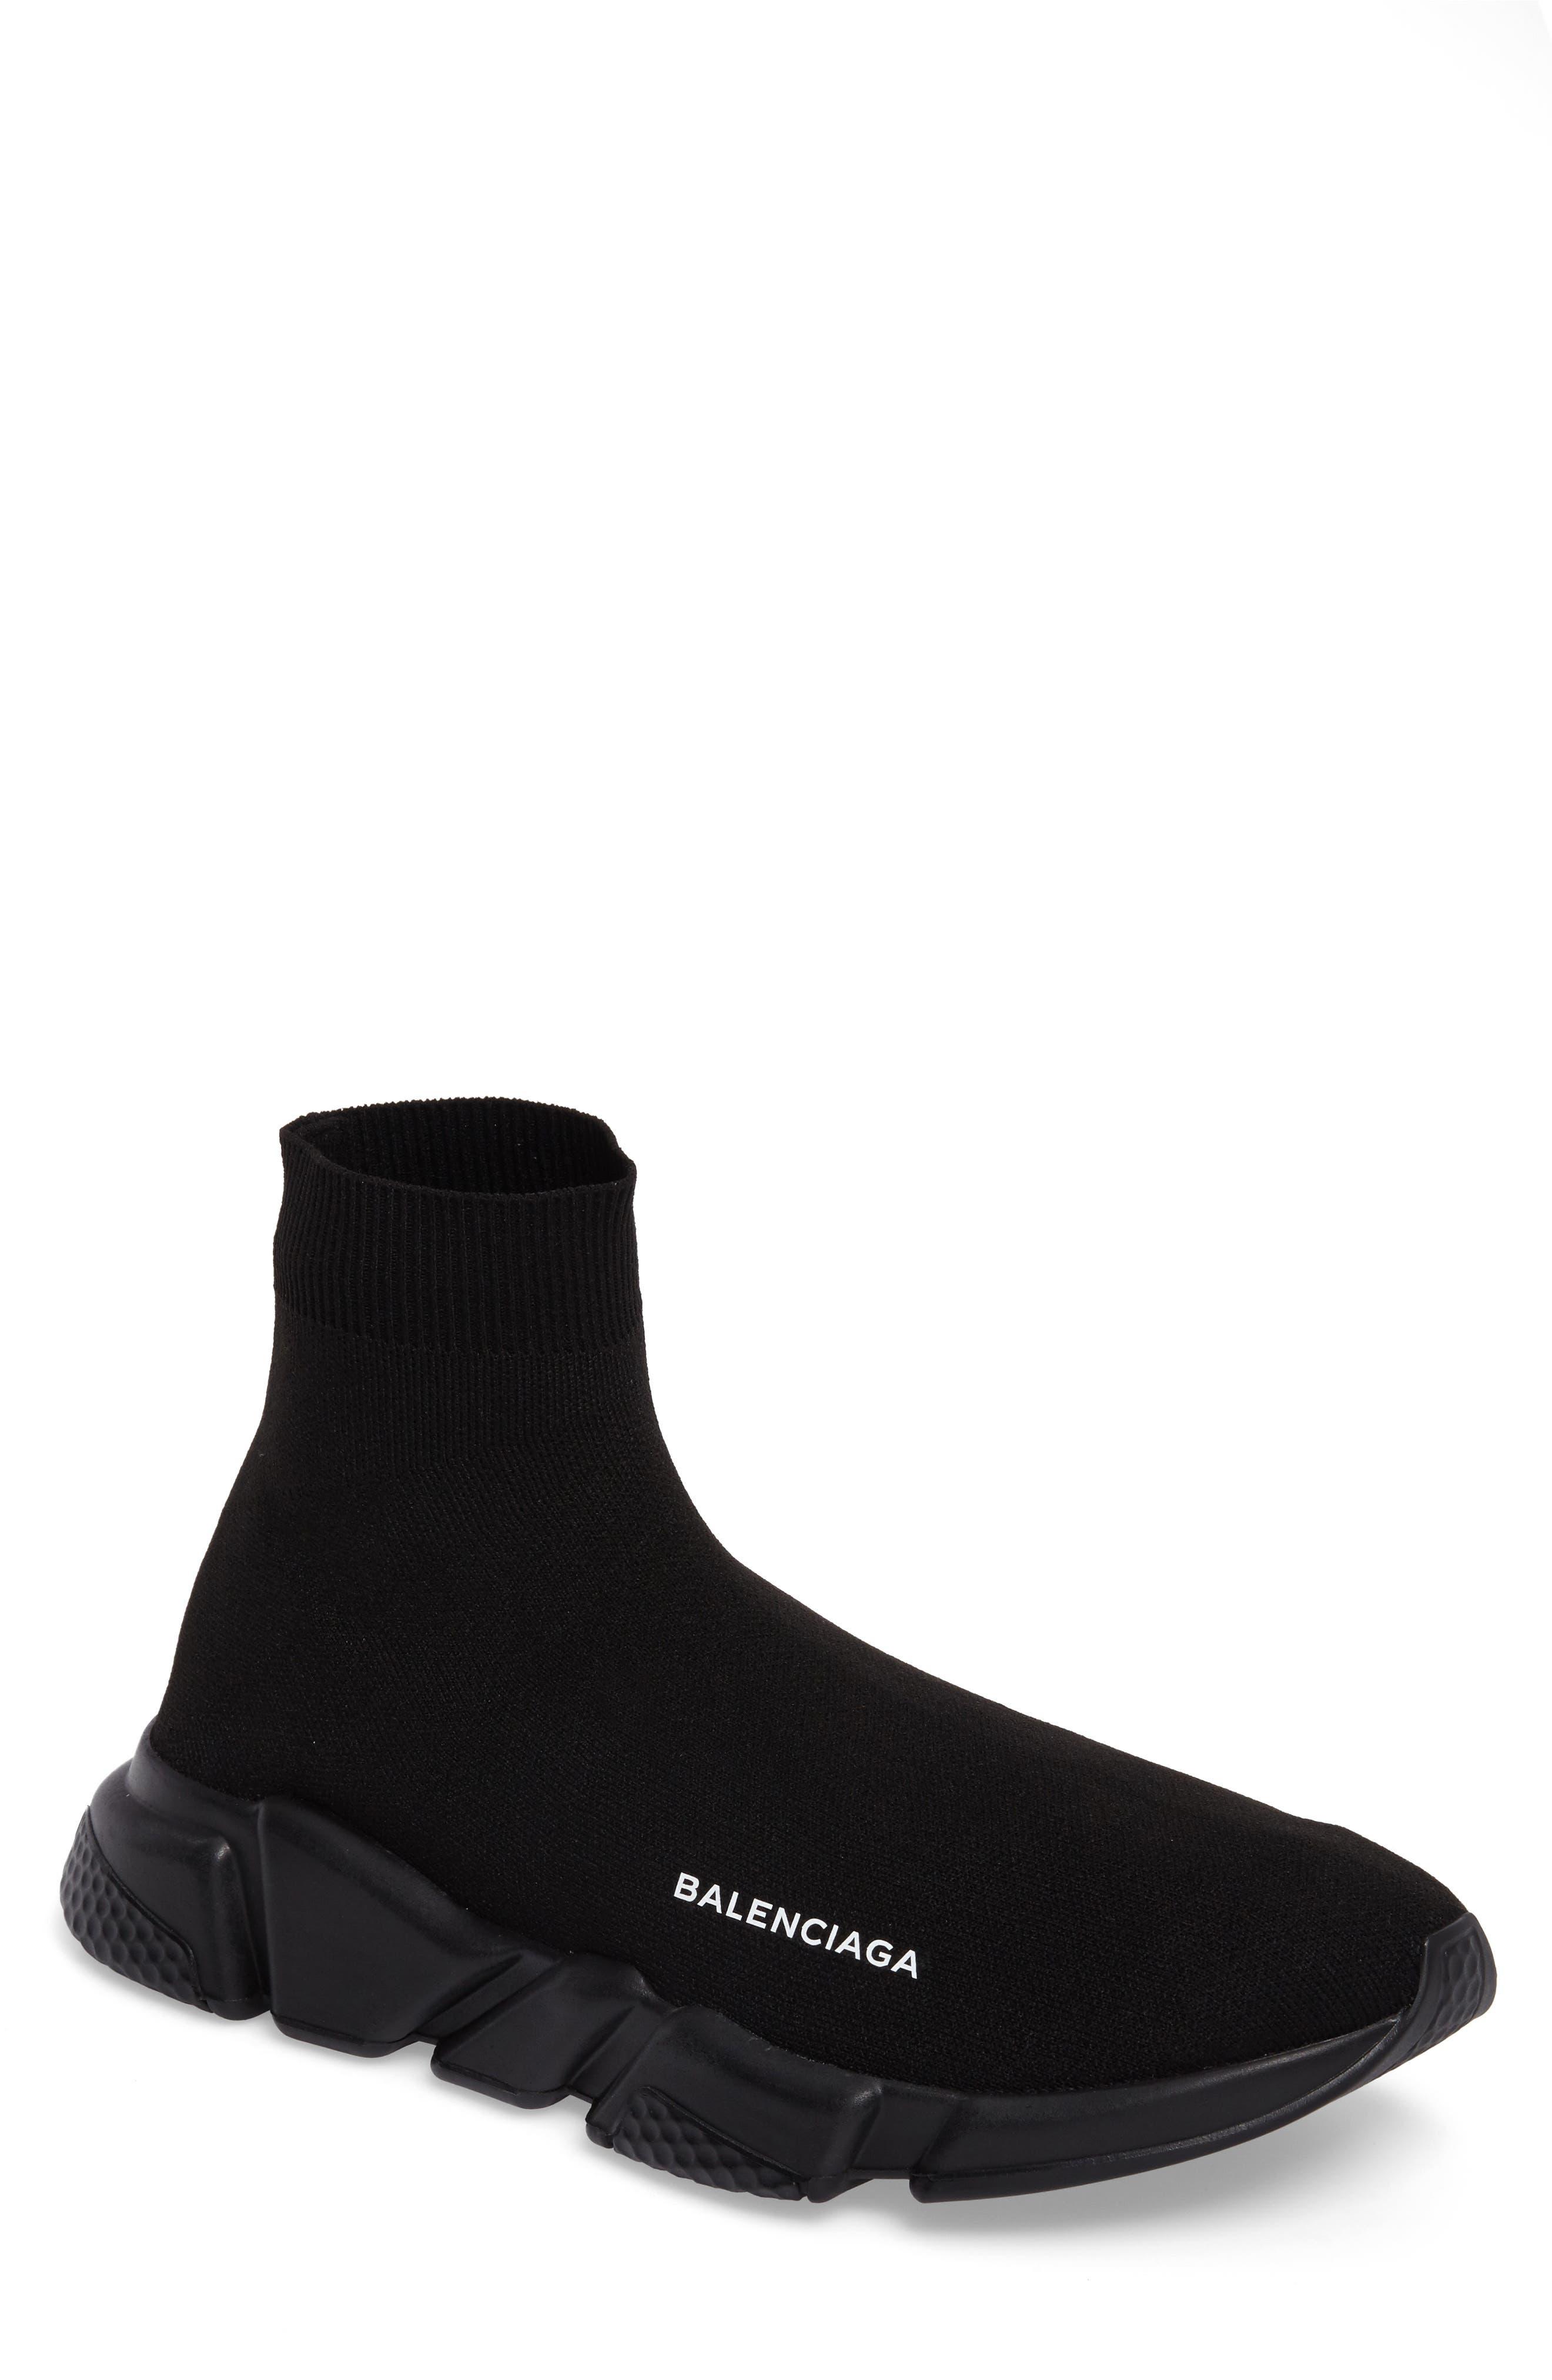 Alternate Image 1 Selected - Balenciaga Speed High Slip-On (Men)